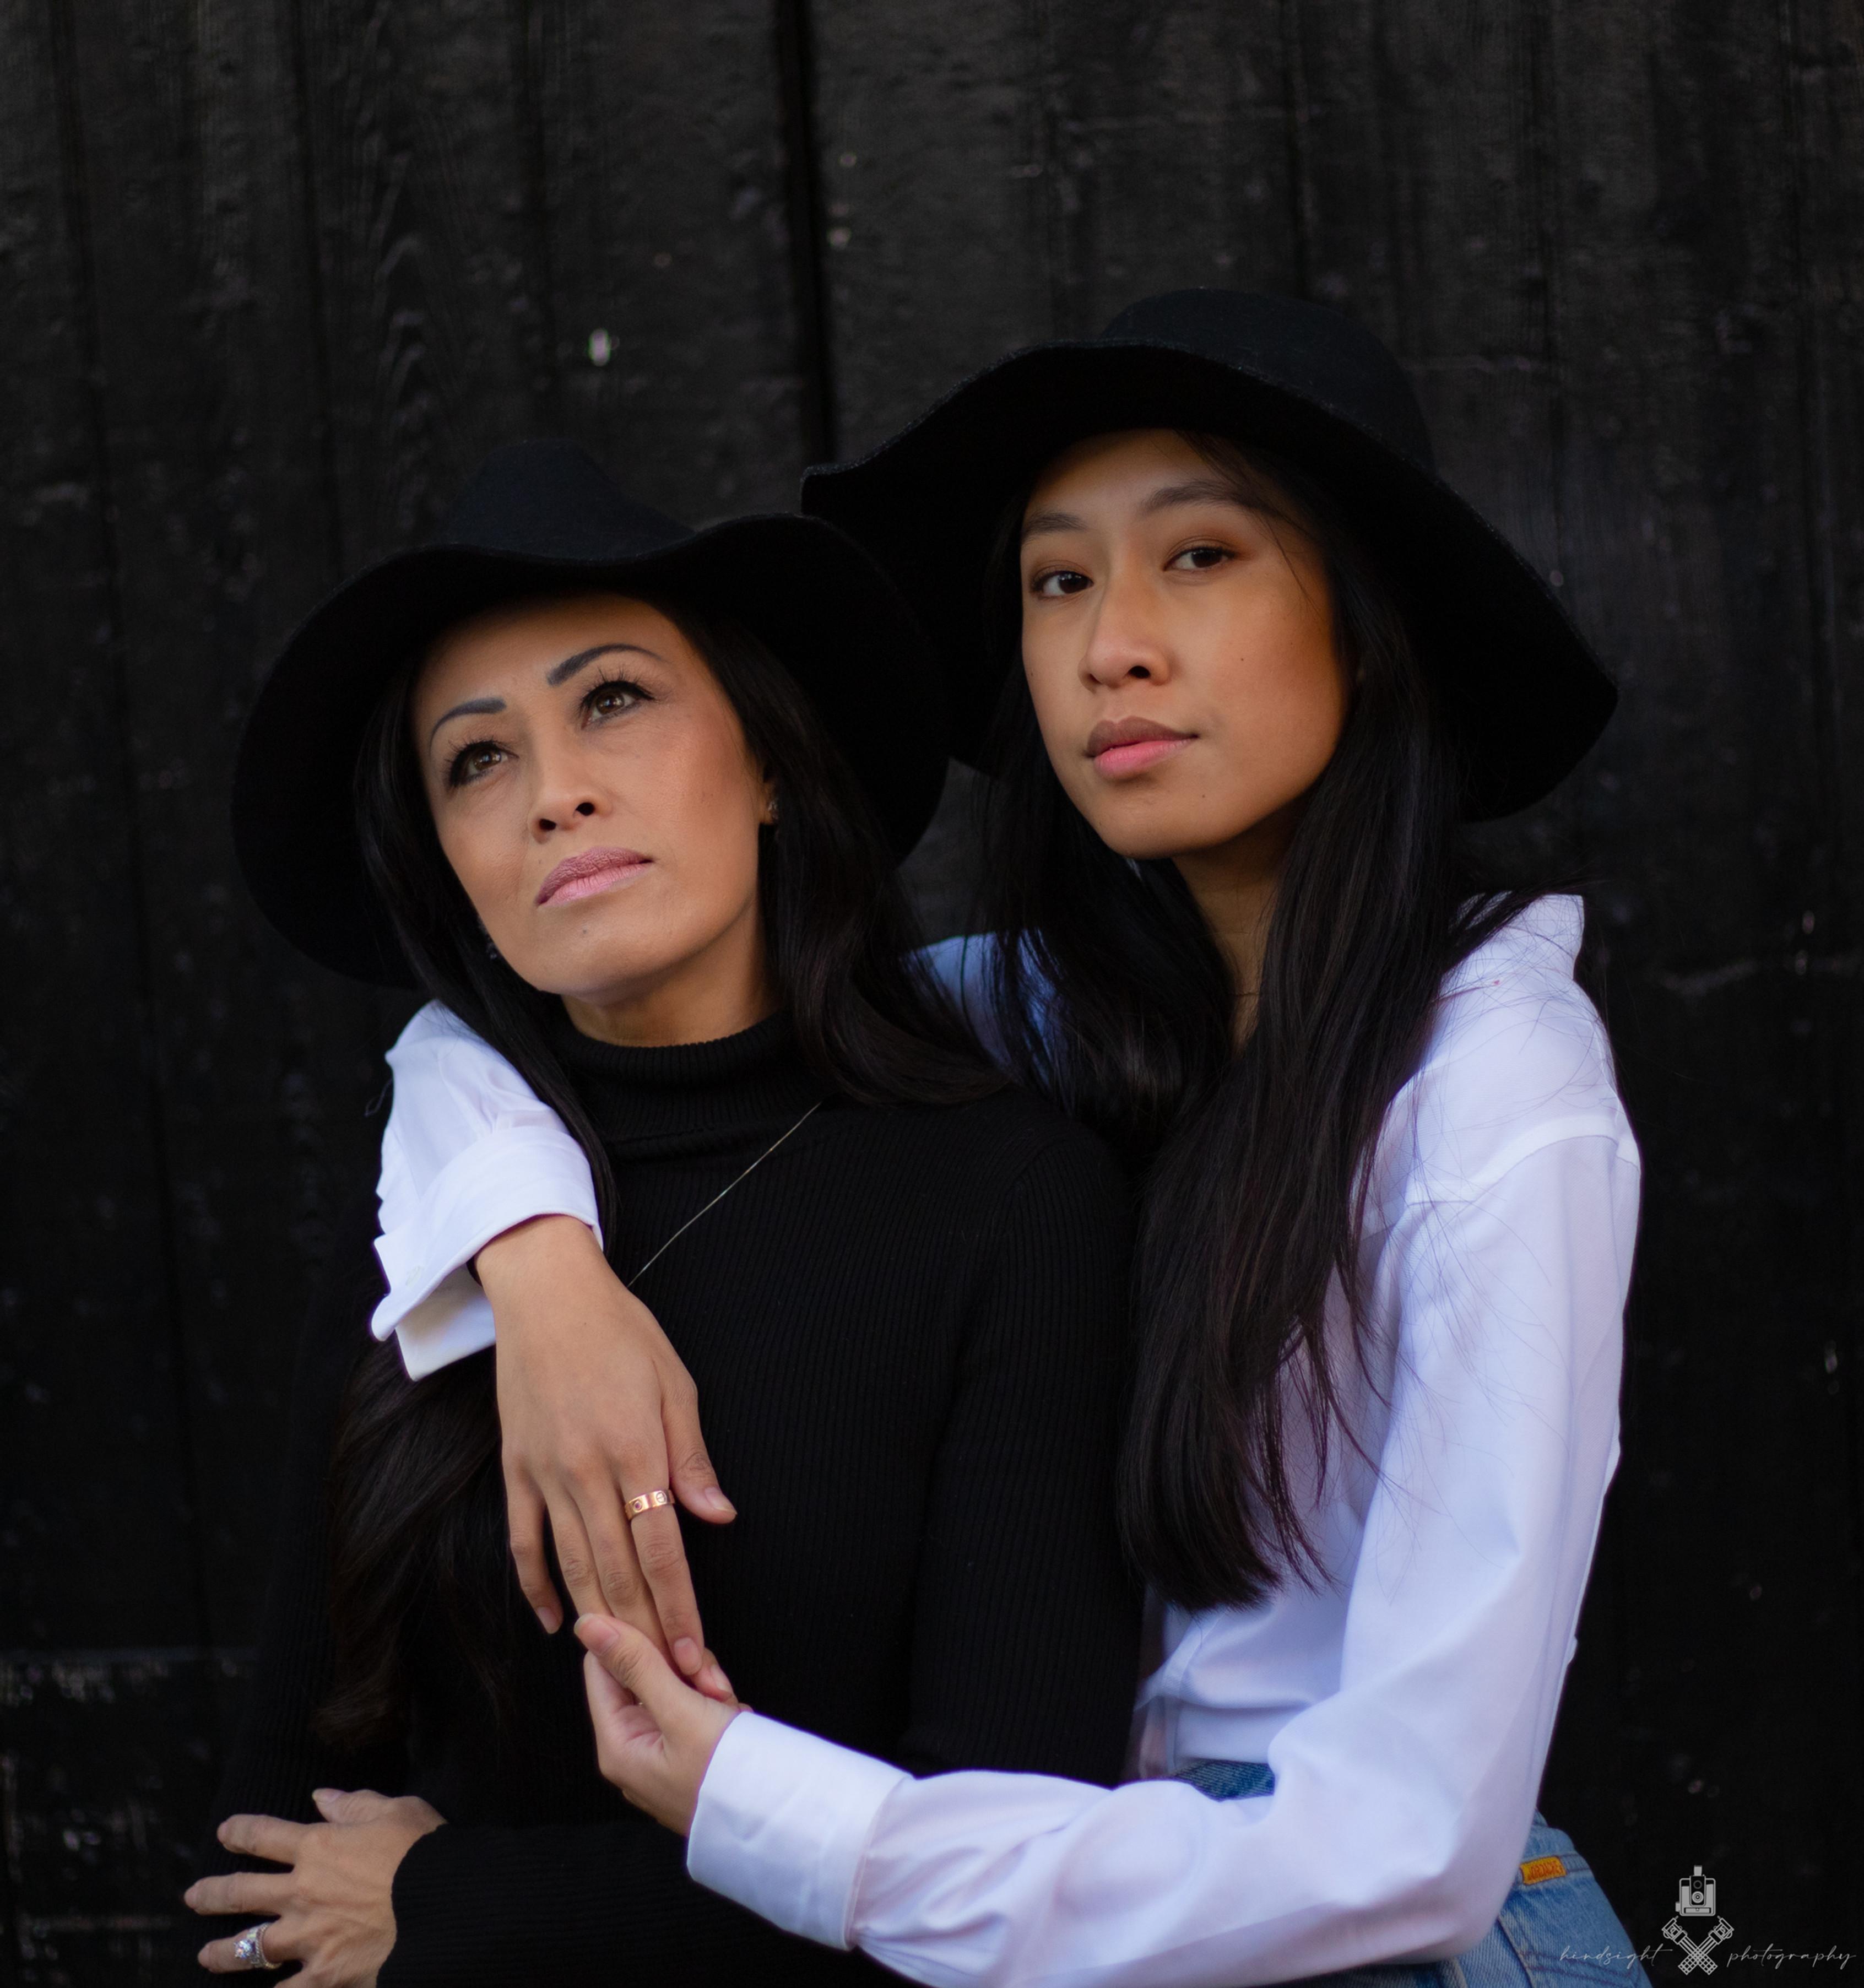 Family & Portrait Photography